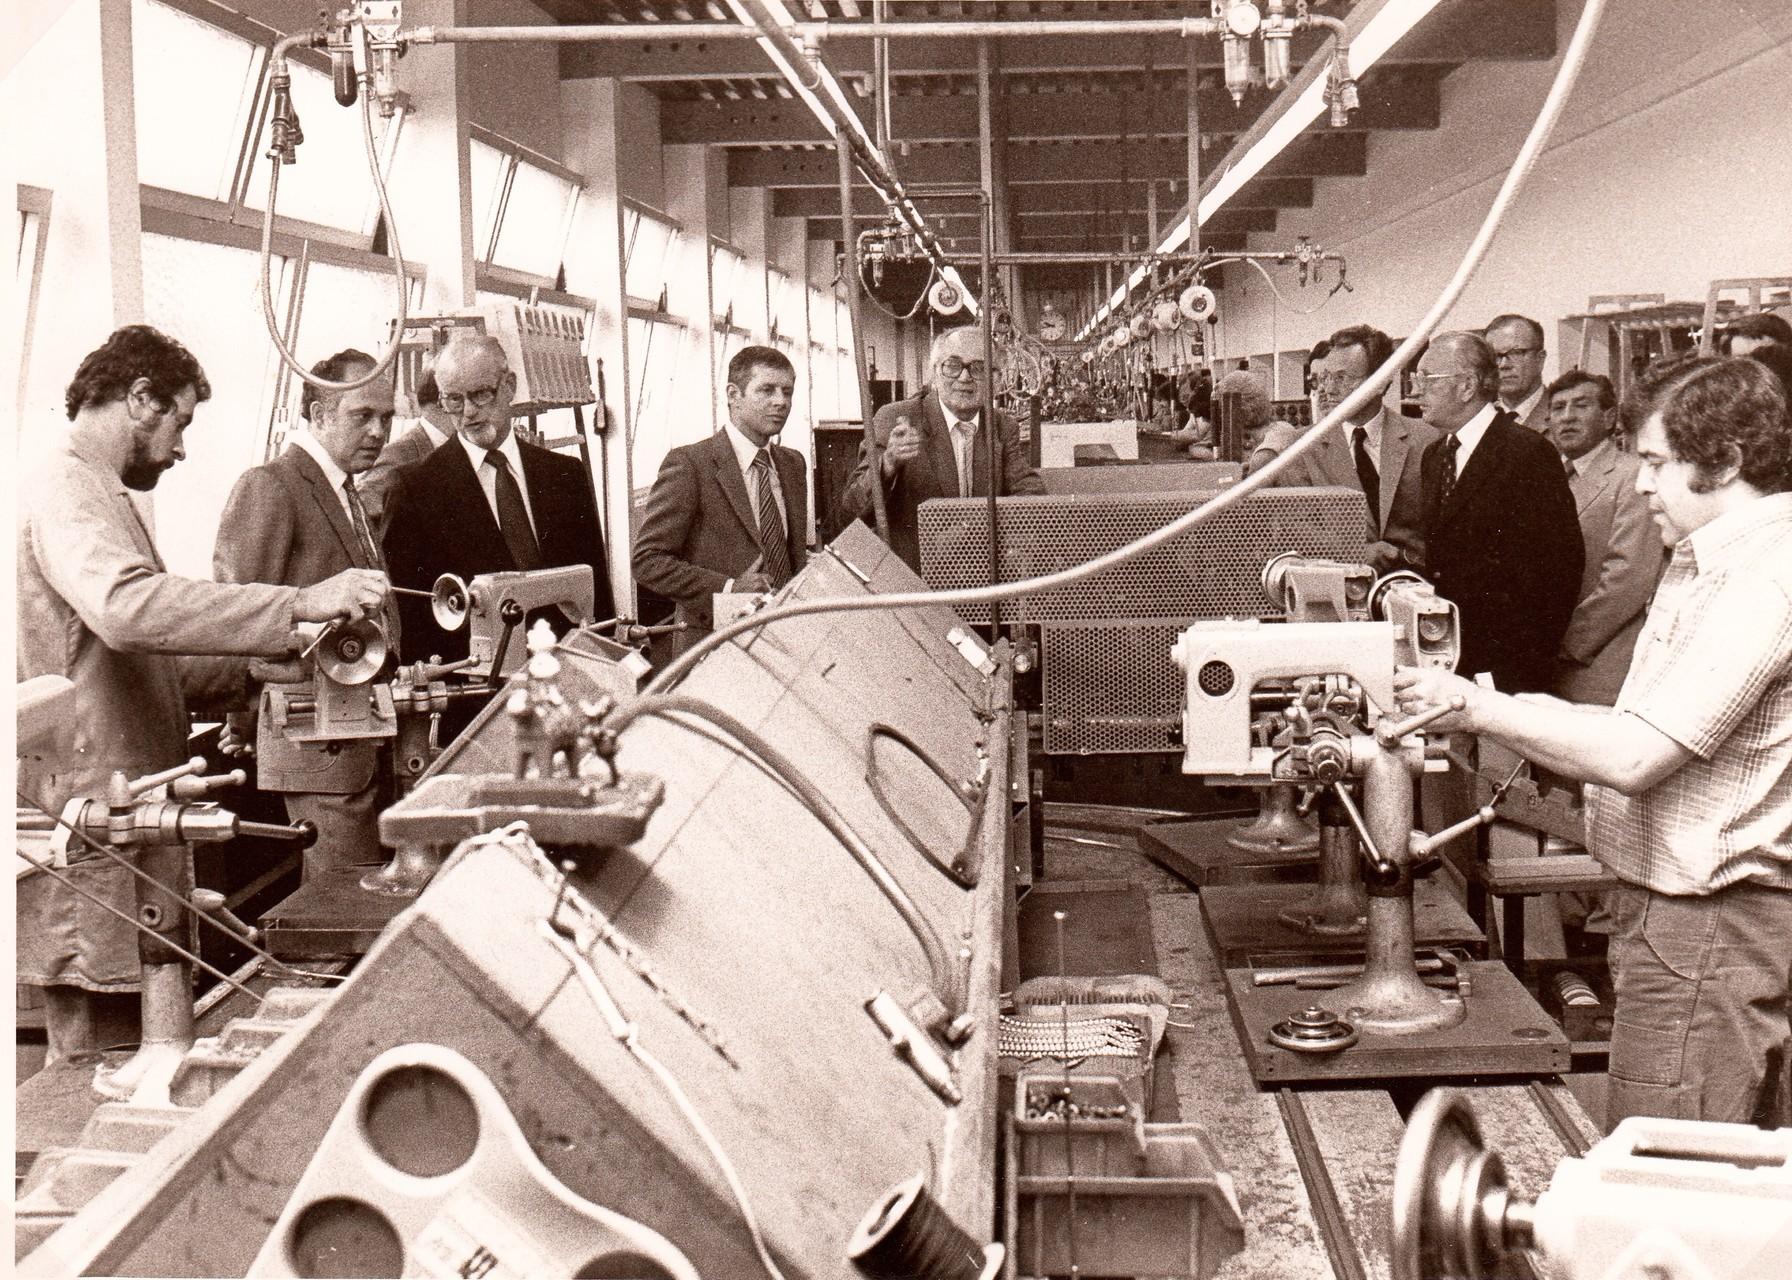 Industriemontage 1974